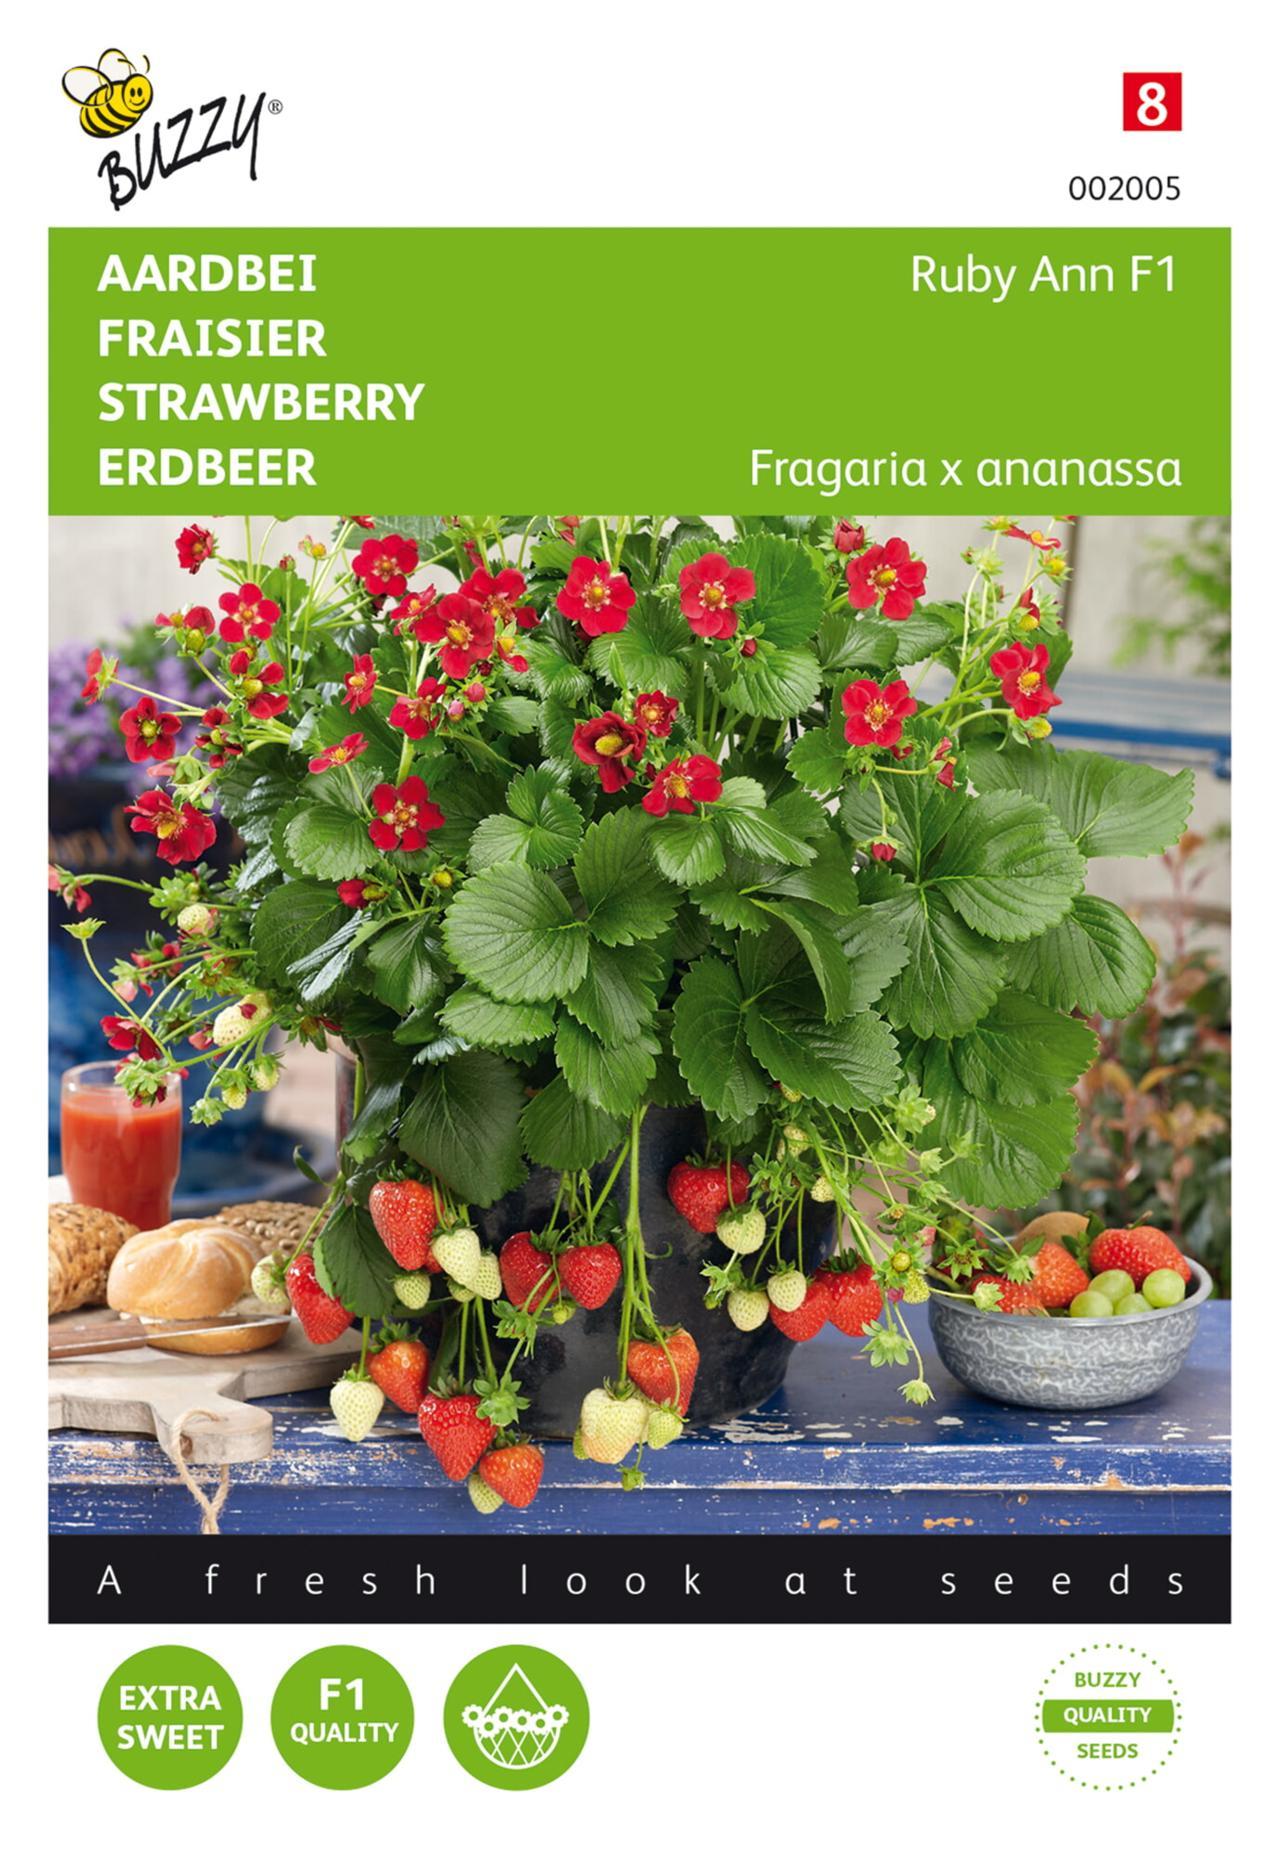 Fragaria x ananassa 'Ruby Ann F1' plant